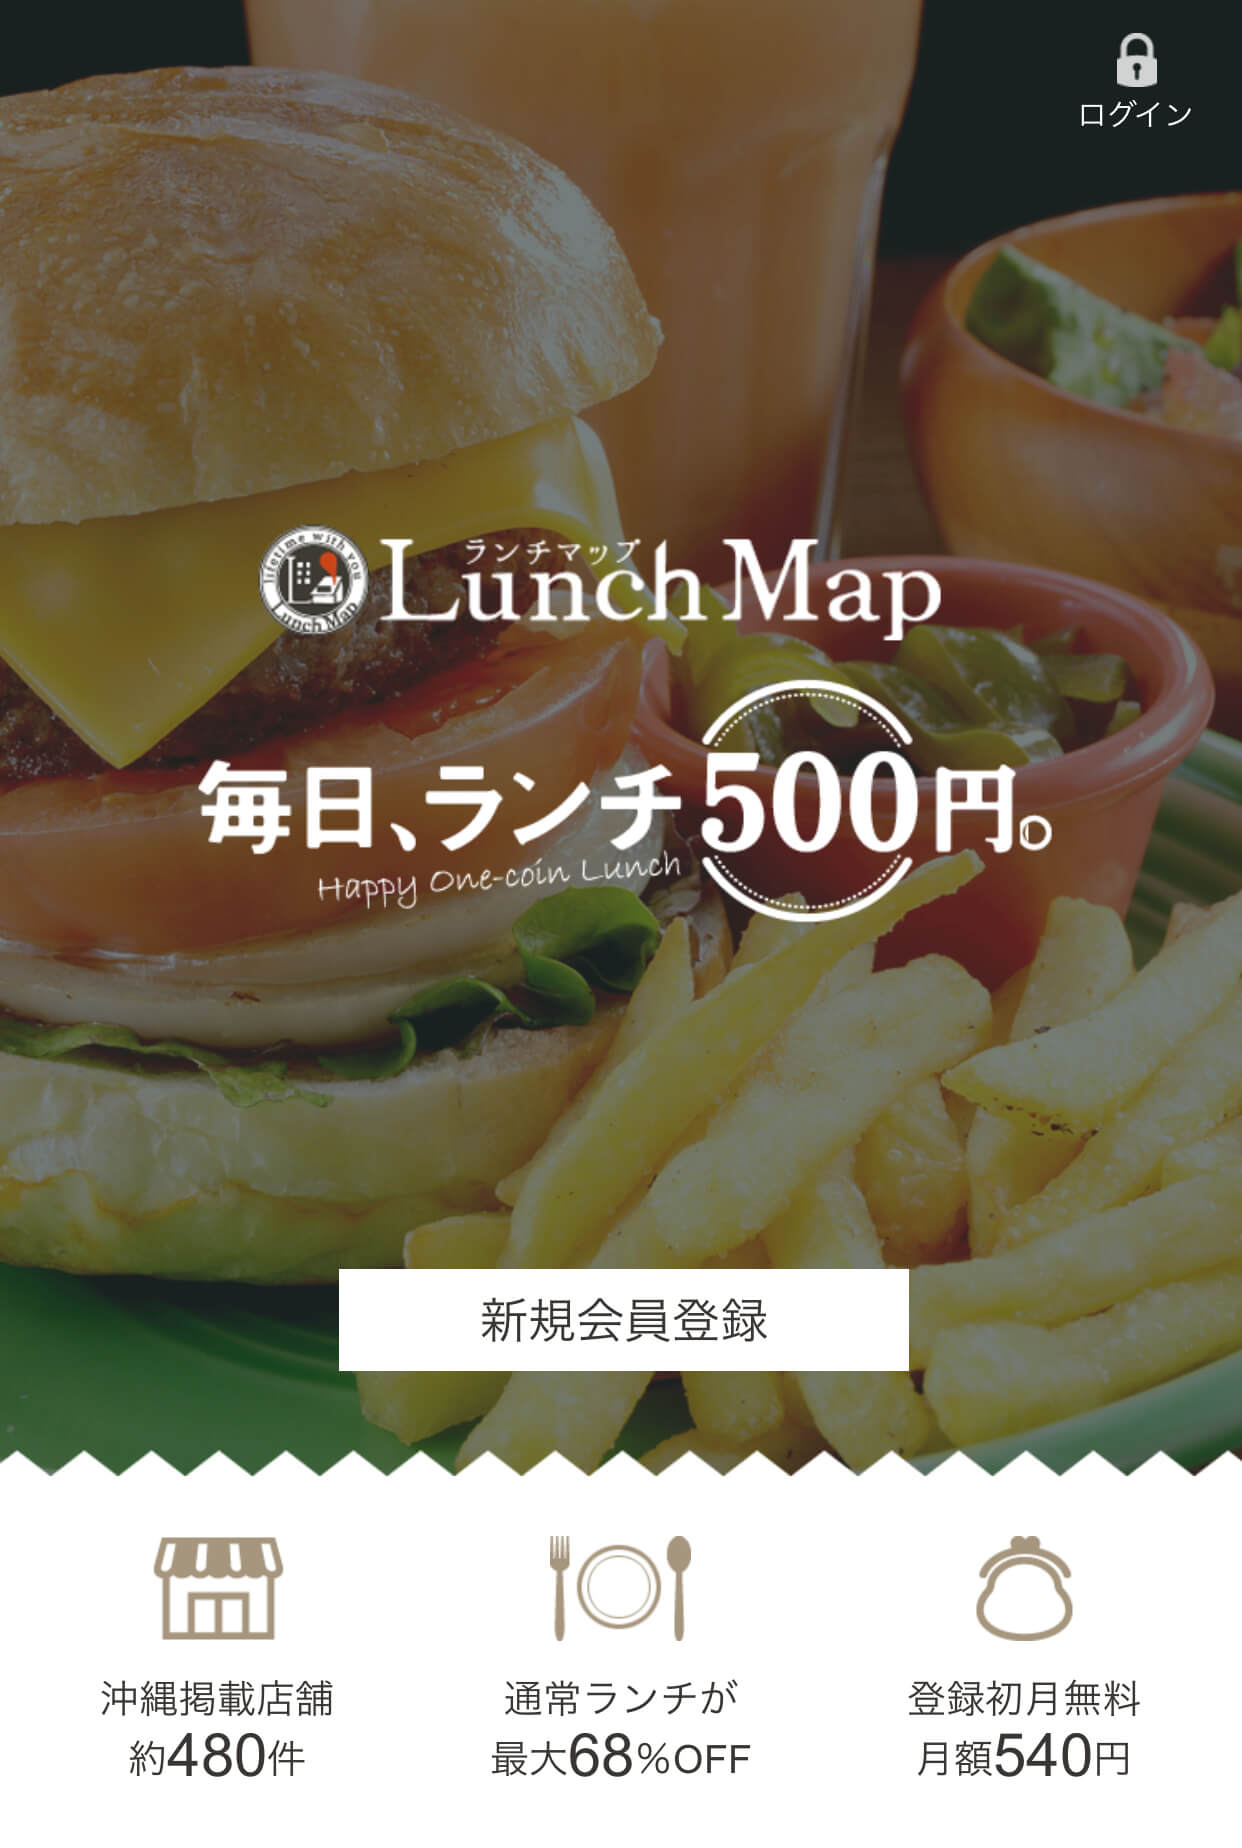 lunchmap_006